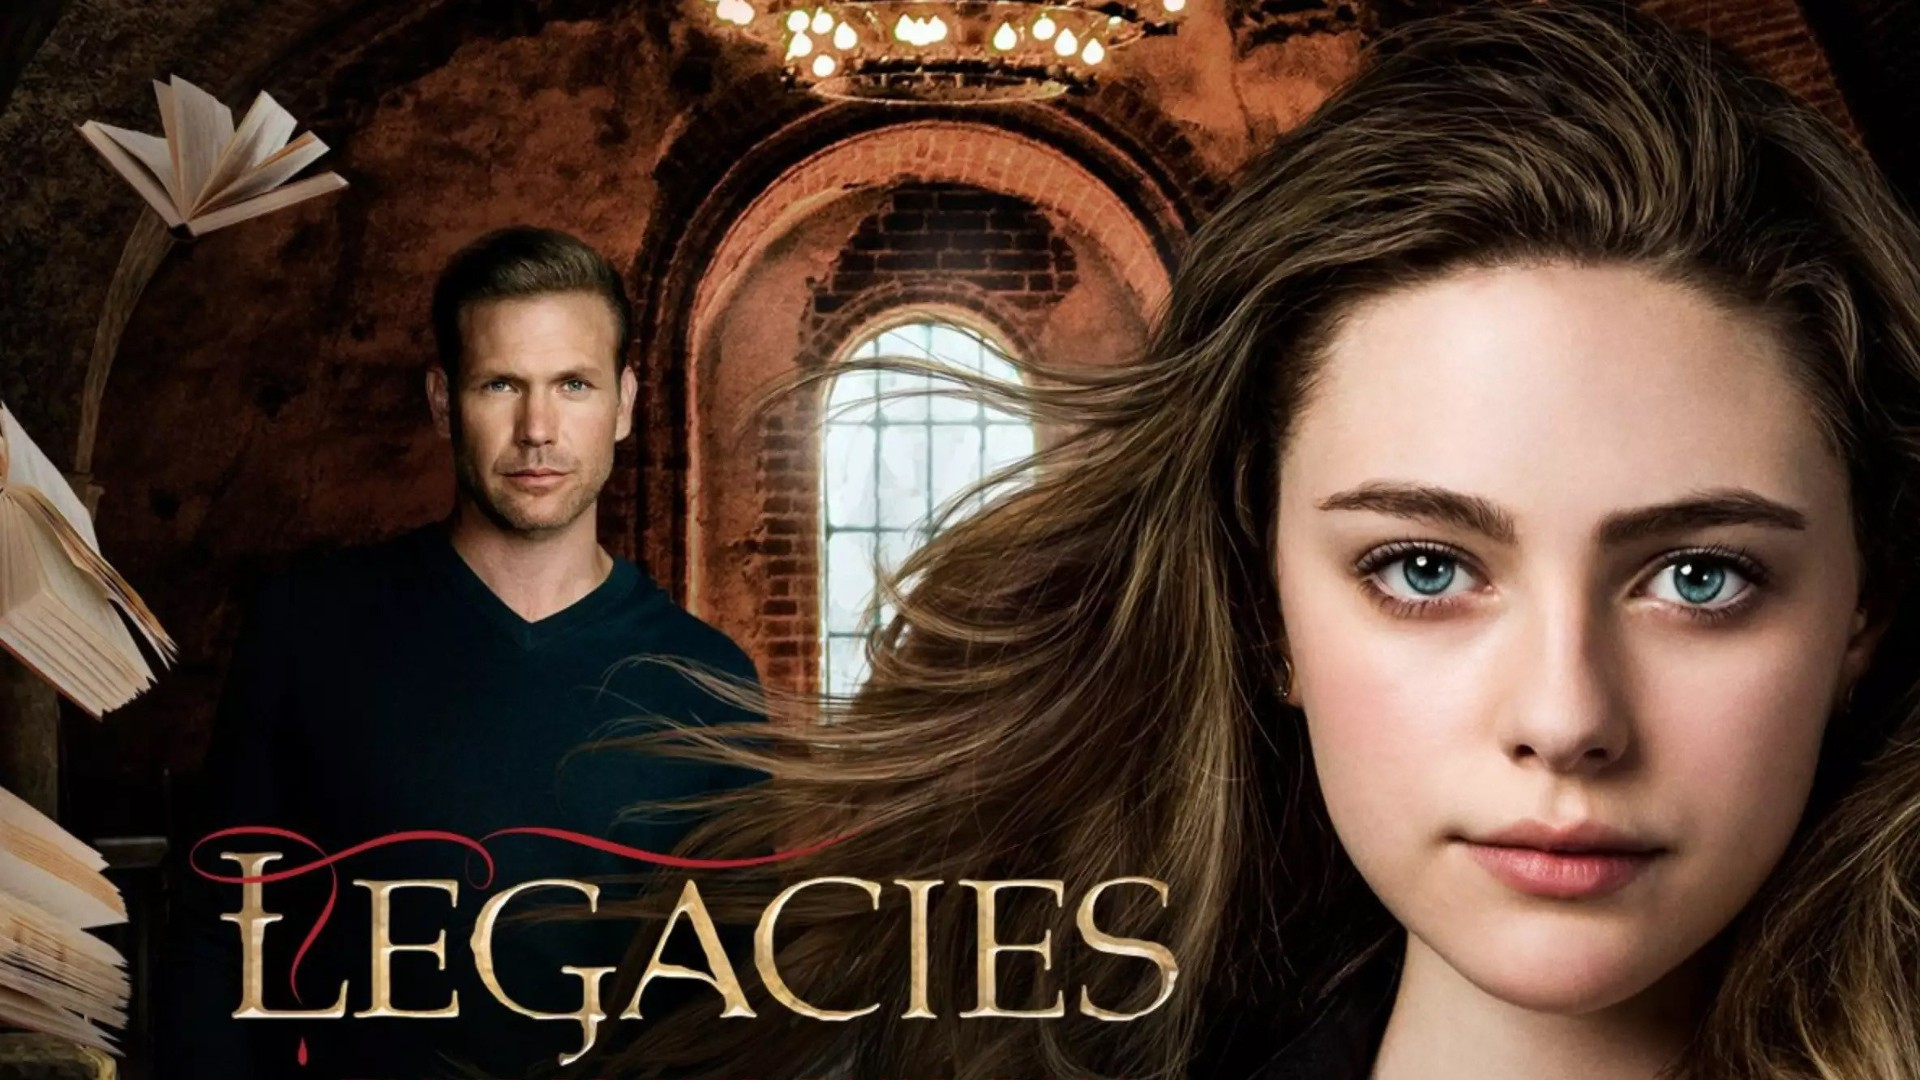 [Official] Legacies Season 2 Episode 4 ~ The CW